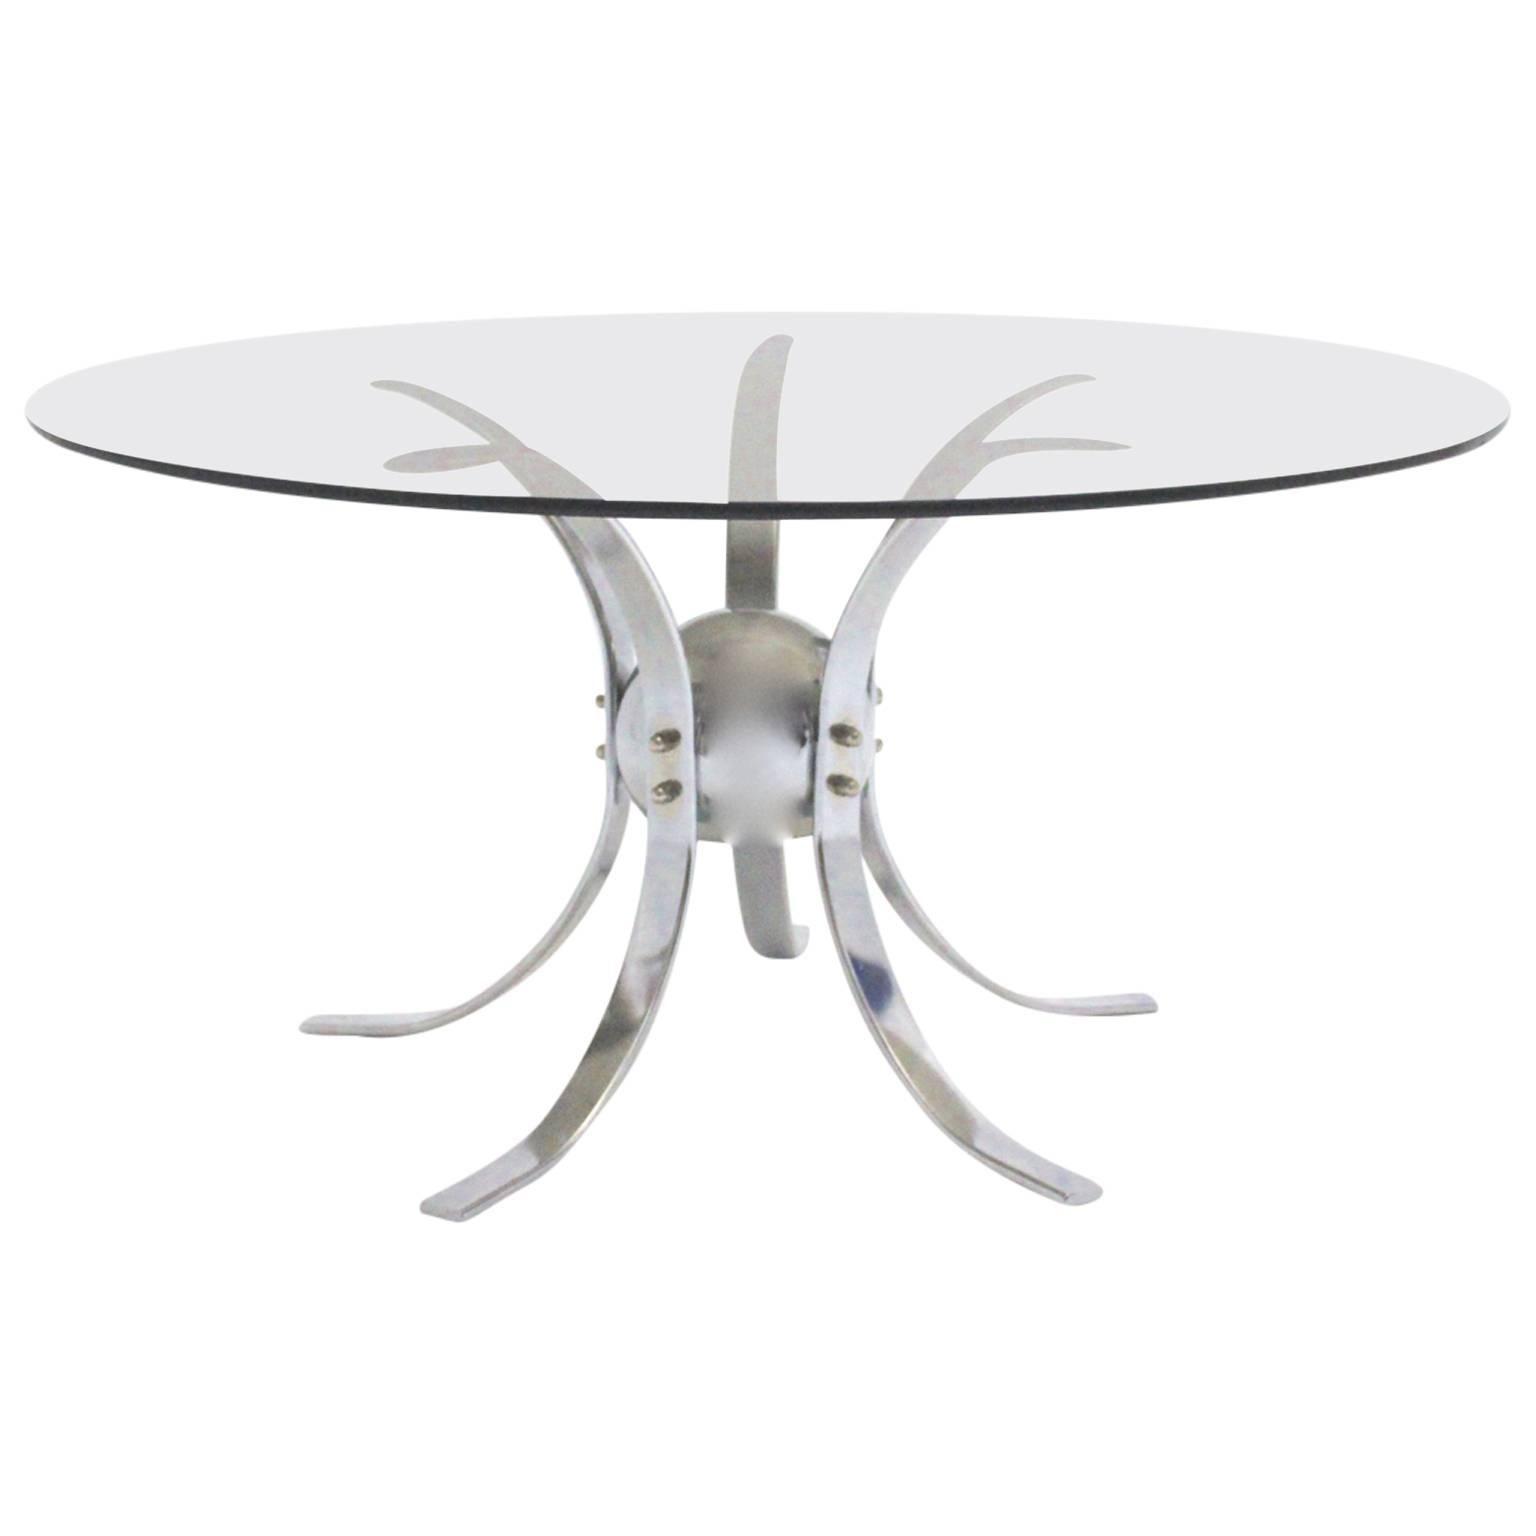 Space Age Vintage Chromed Metal Glass Vintage Sputnik Coffee Table 1960